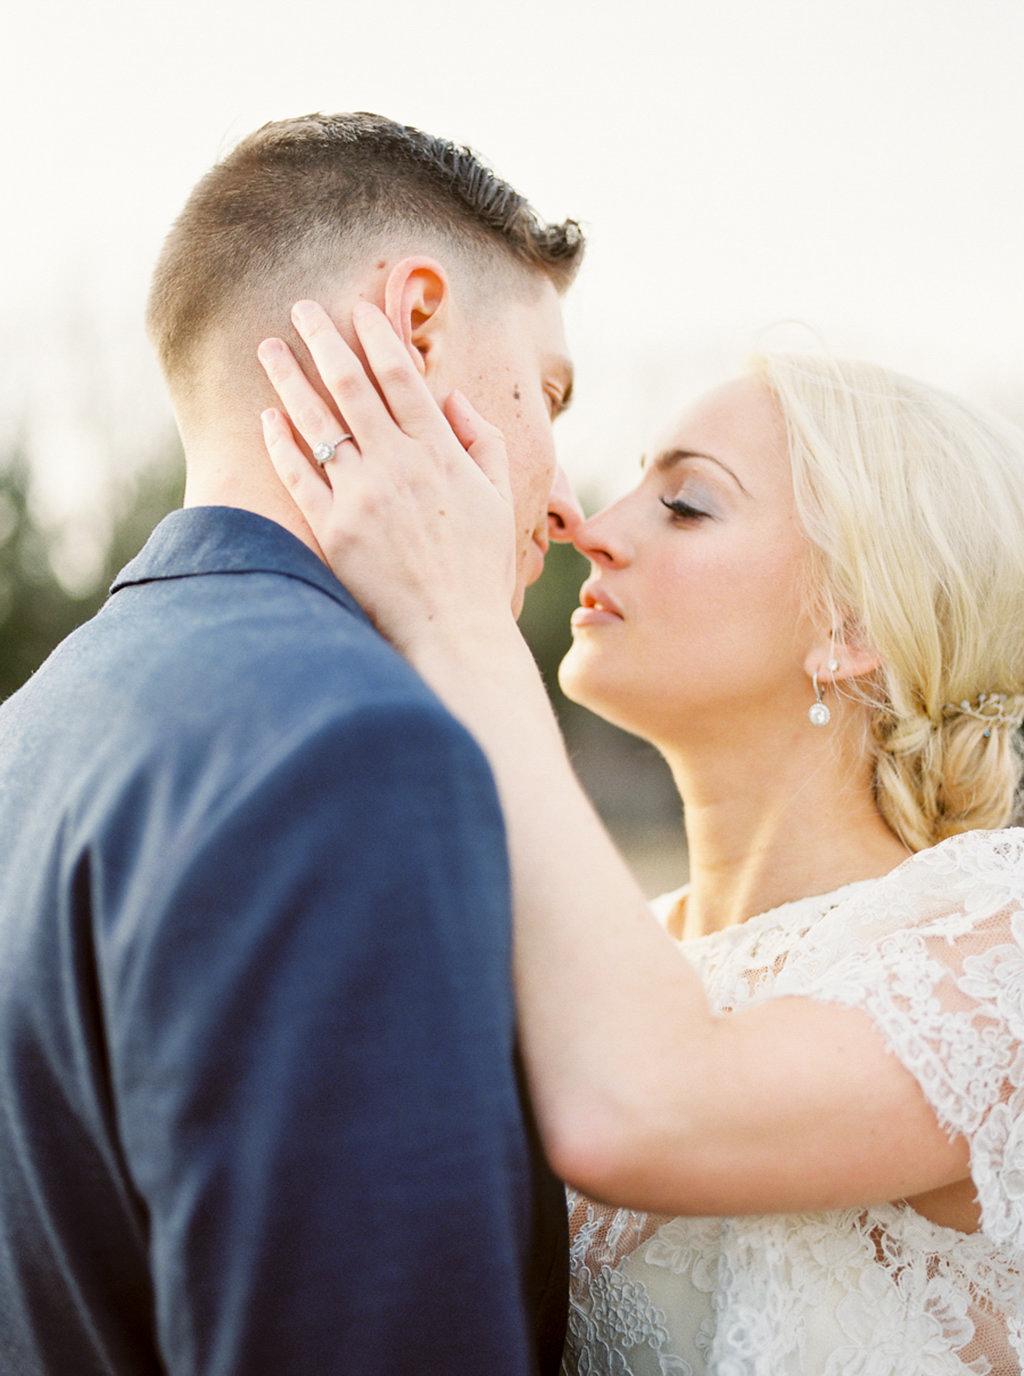 kayla-yestal-photography-vineyard-bride-swish-list-beamer-falls-manor-grimsby-engagement-19.jpg